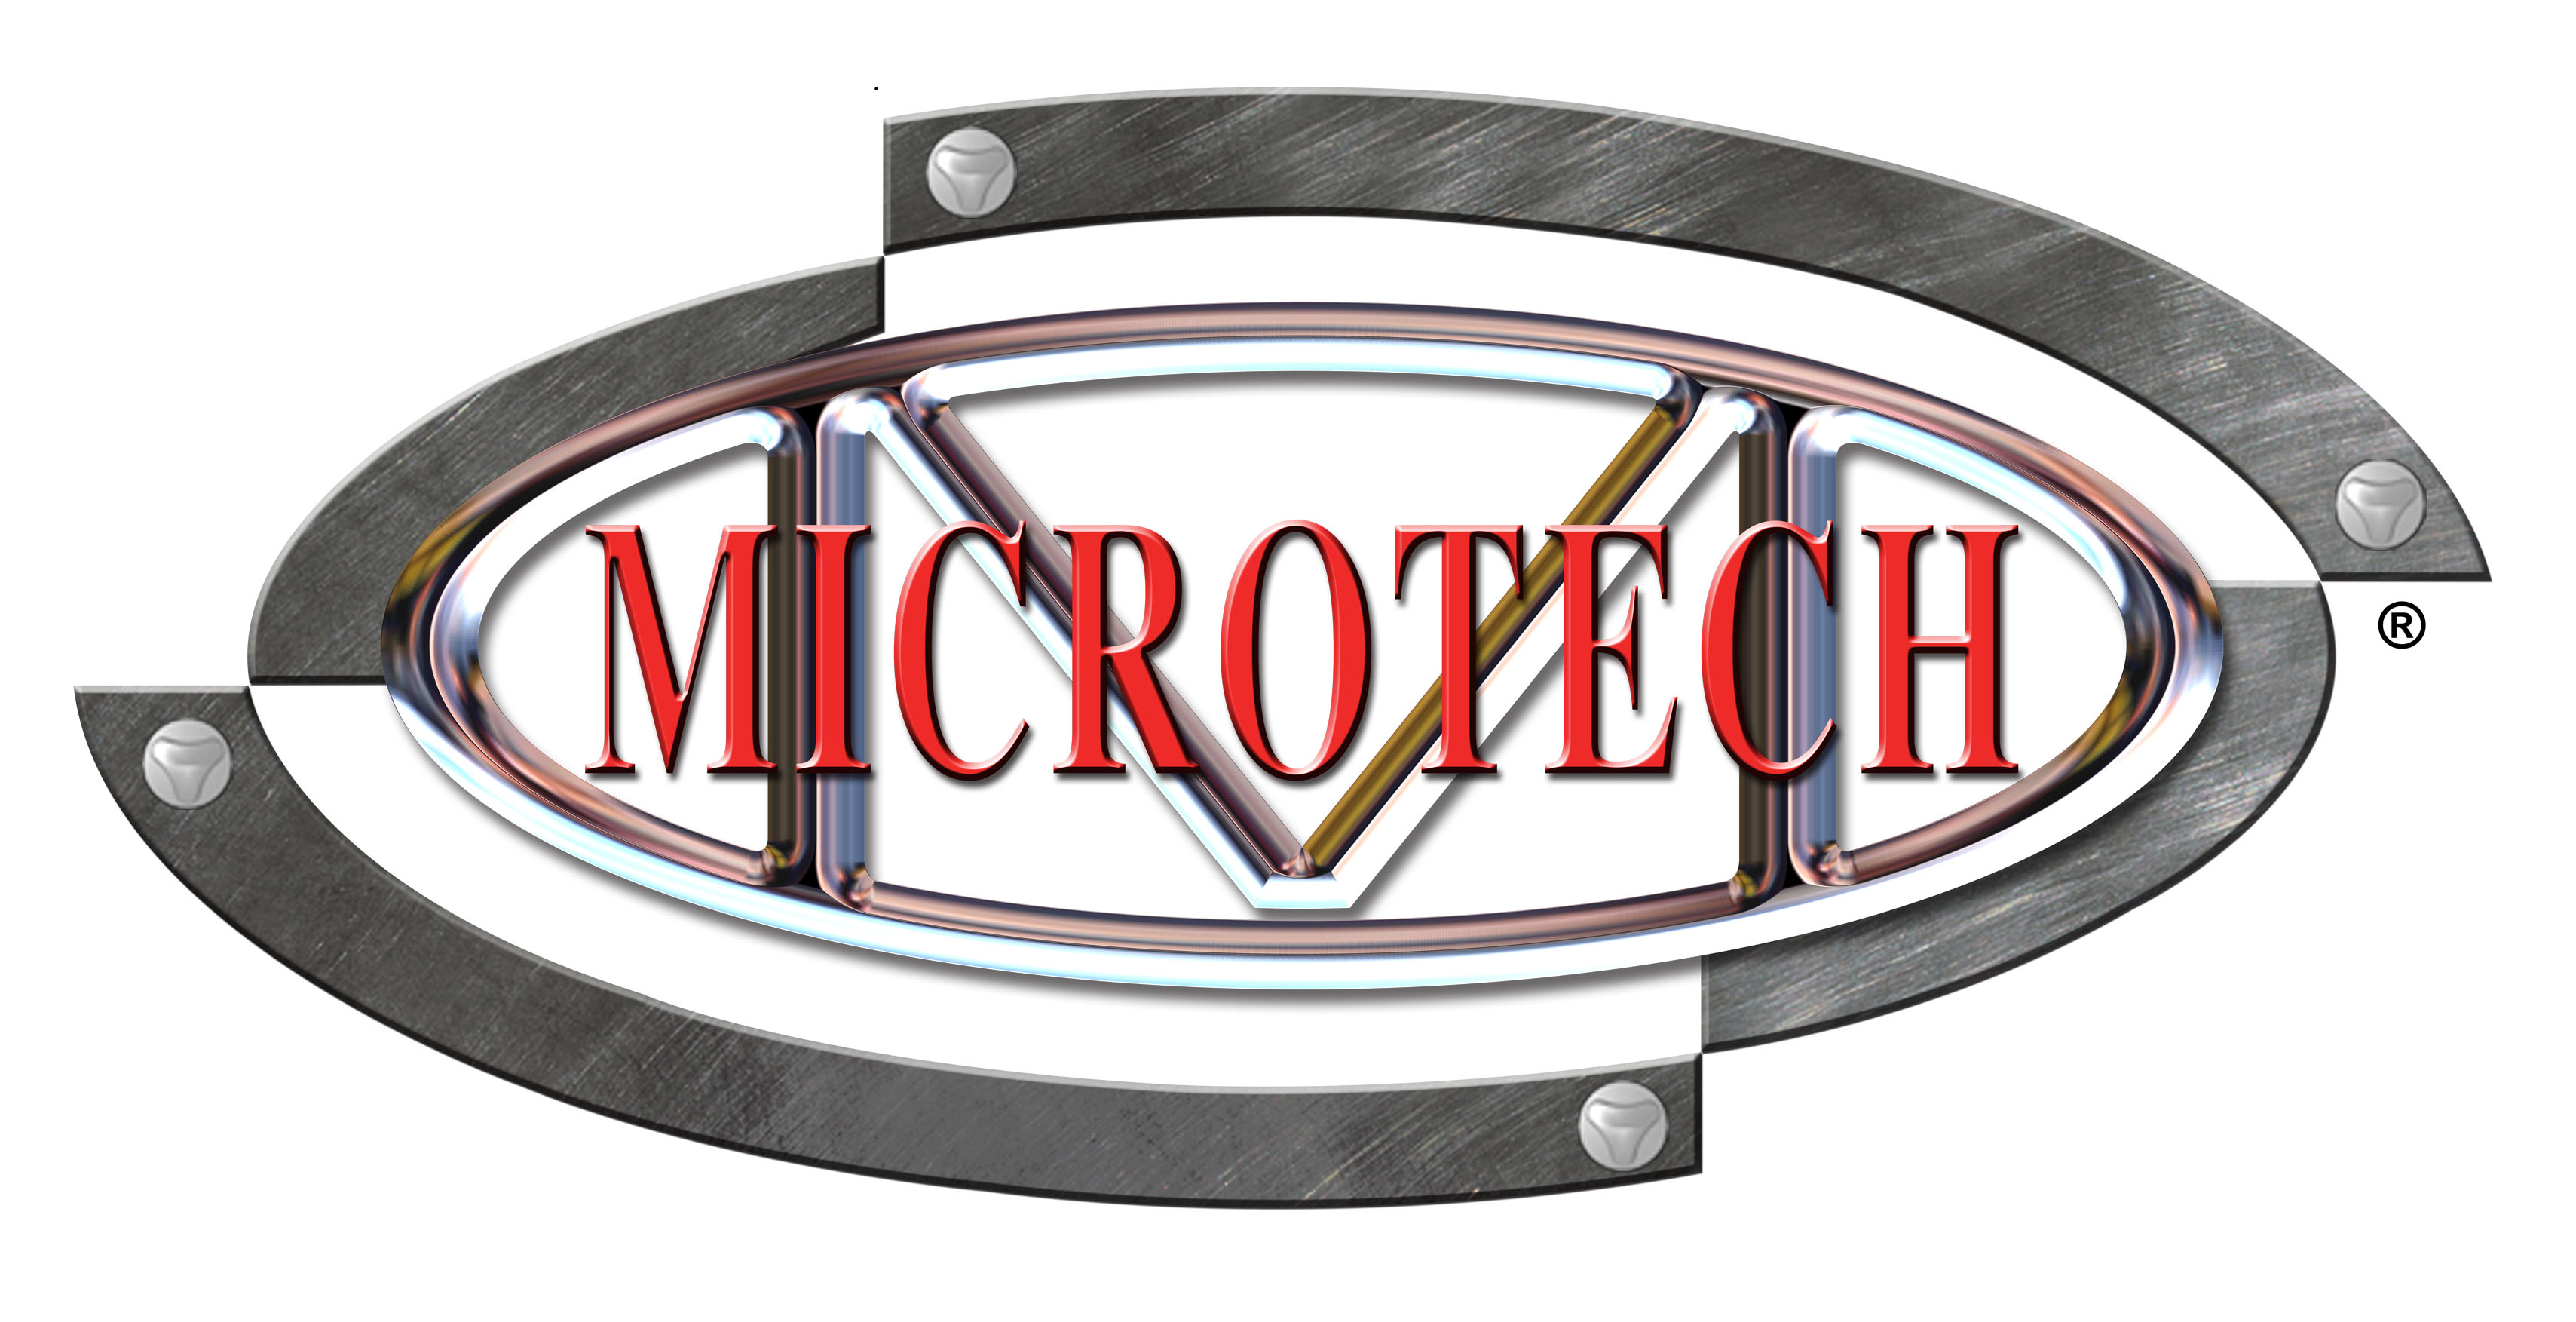 Microtech Logo EDC Brands